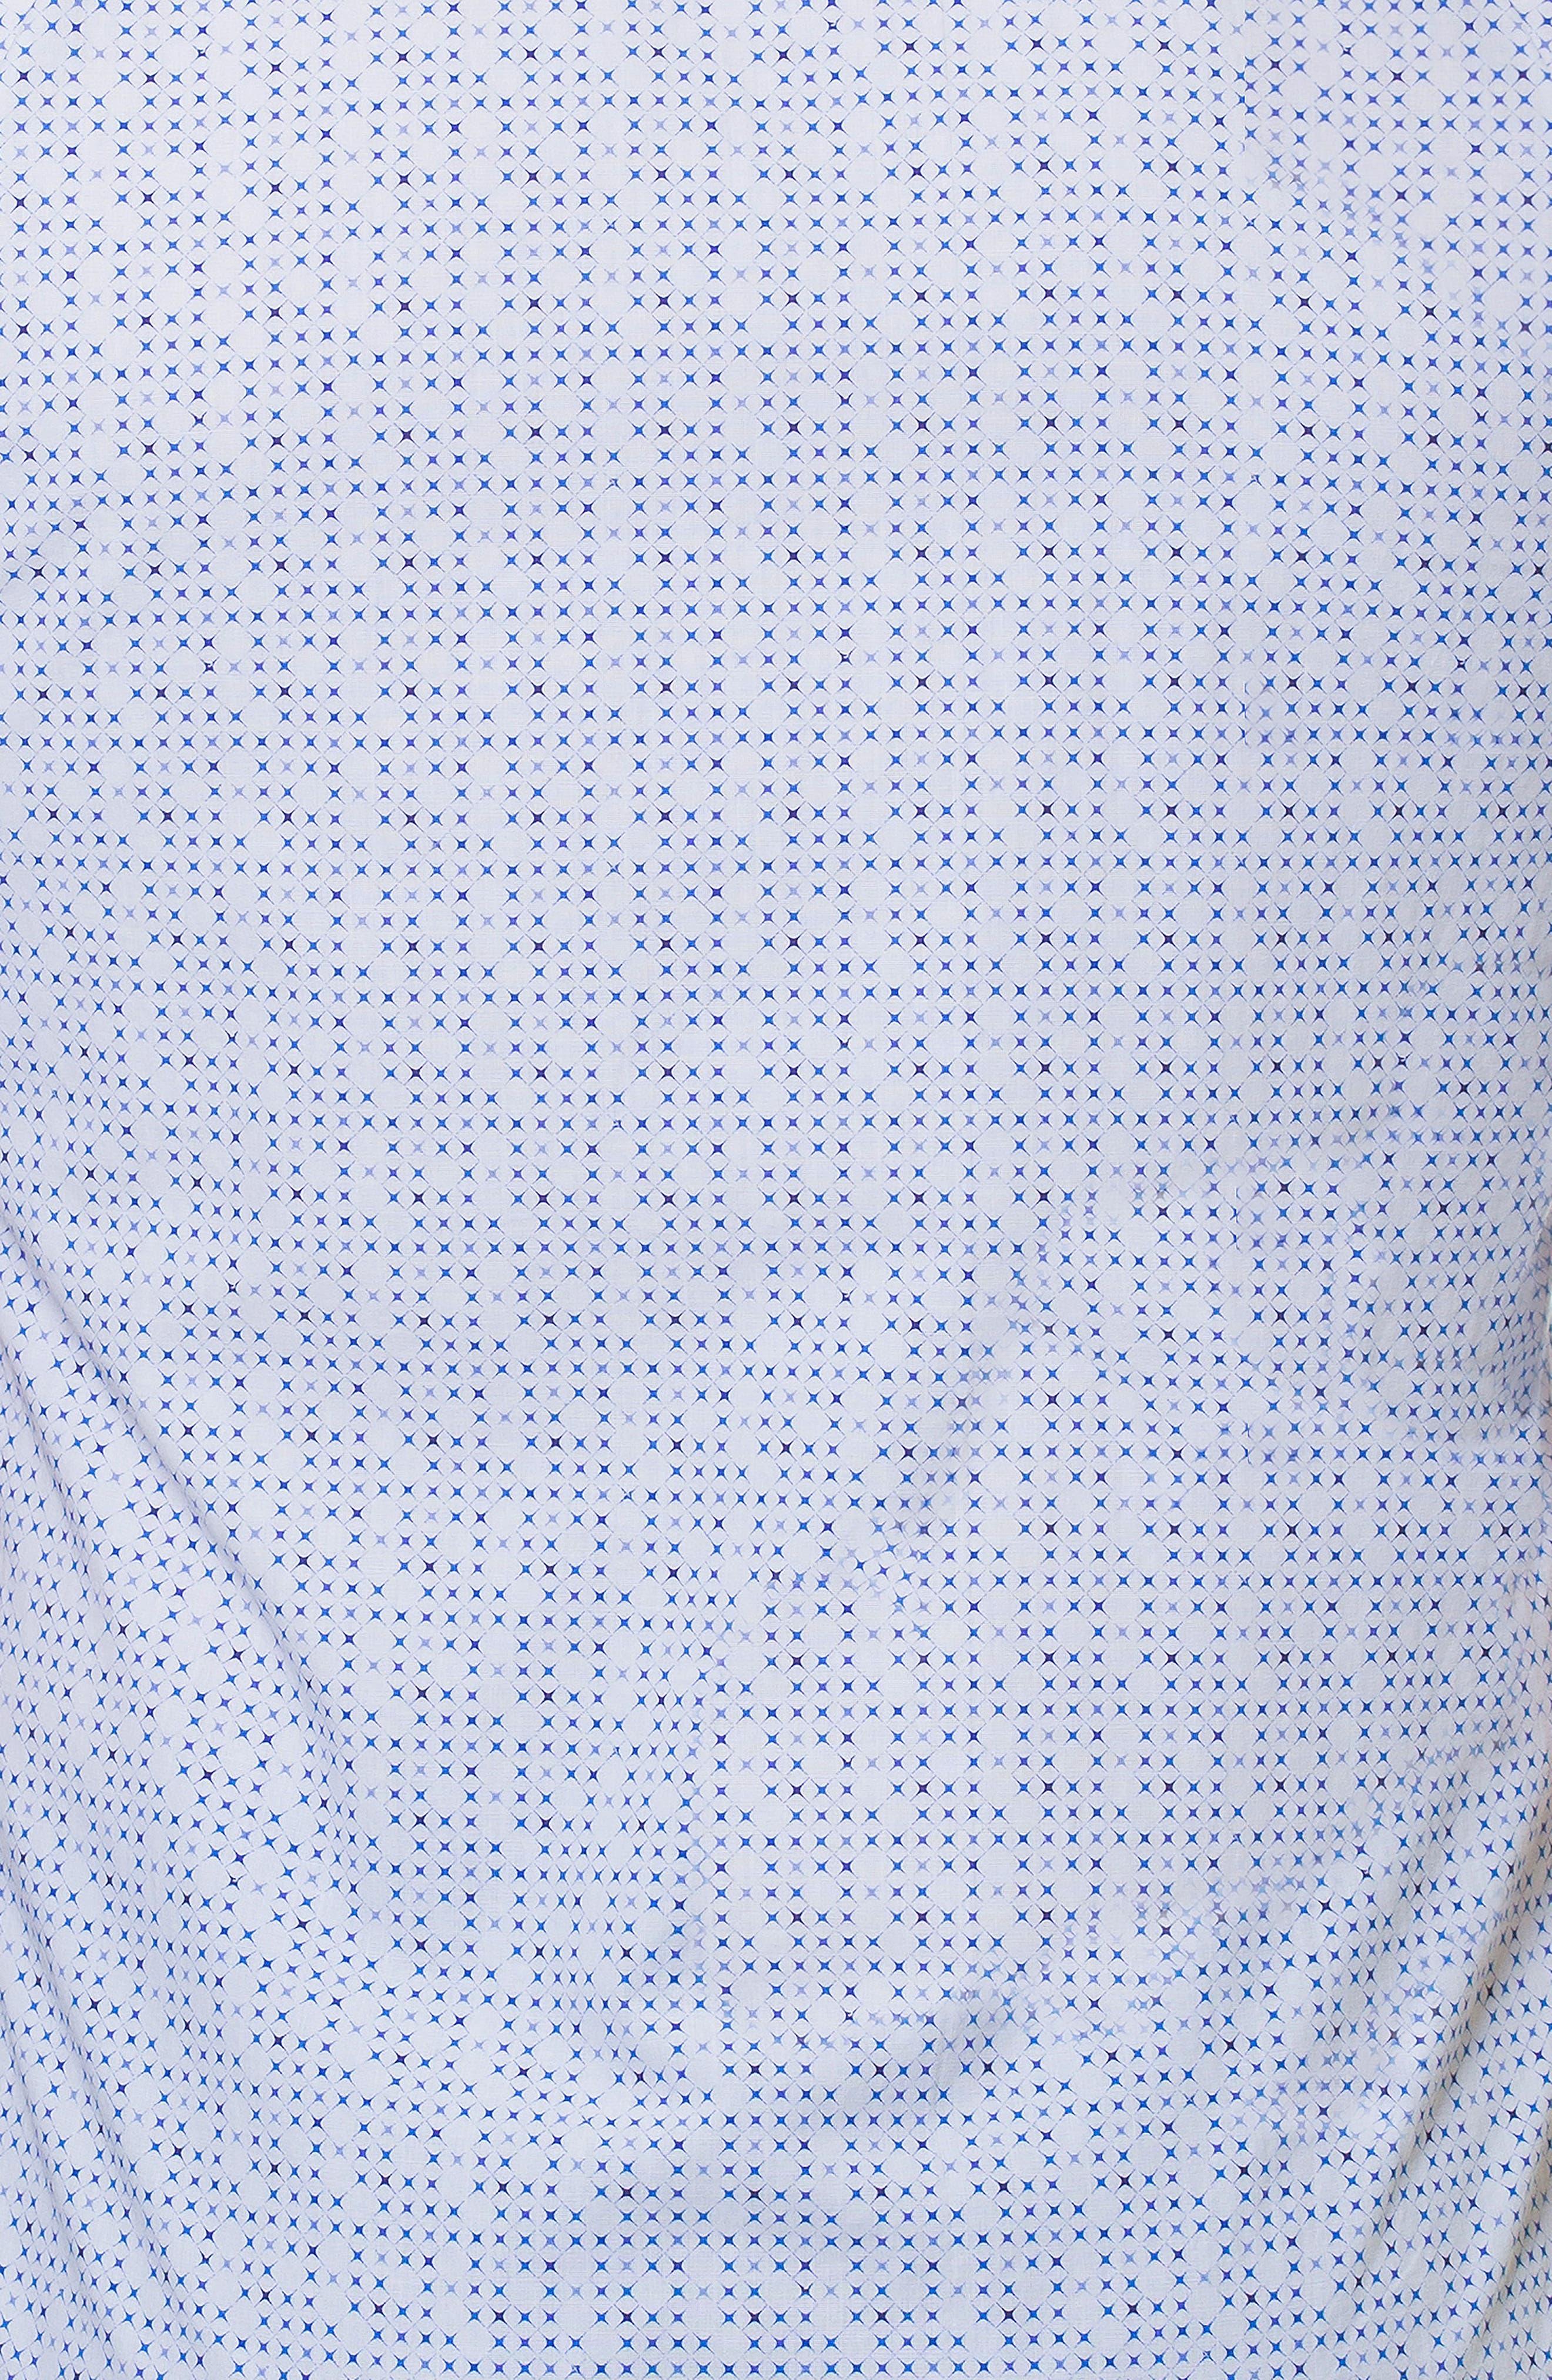 Fresh Mystical Sport Shirt,                             Alternate thumbnail 3, color,                             110